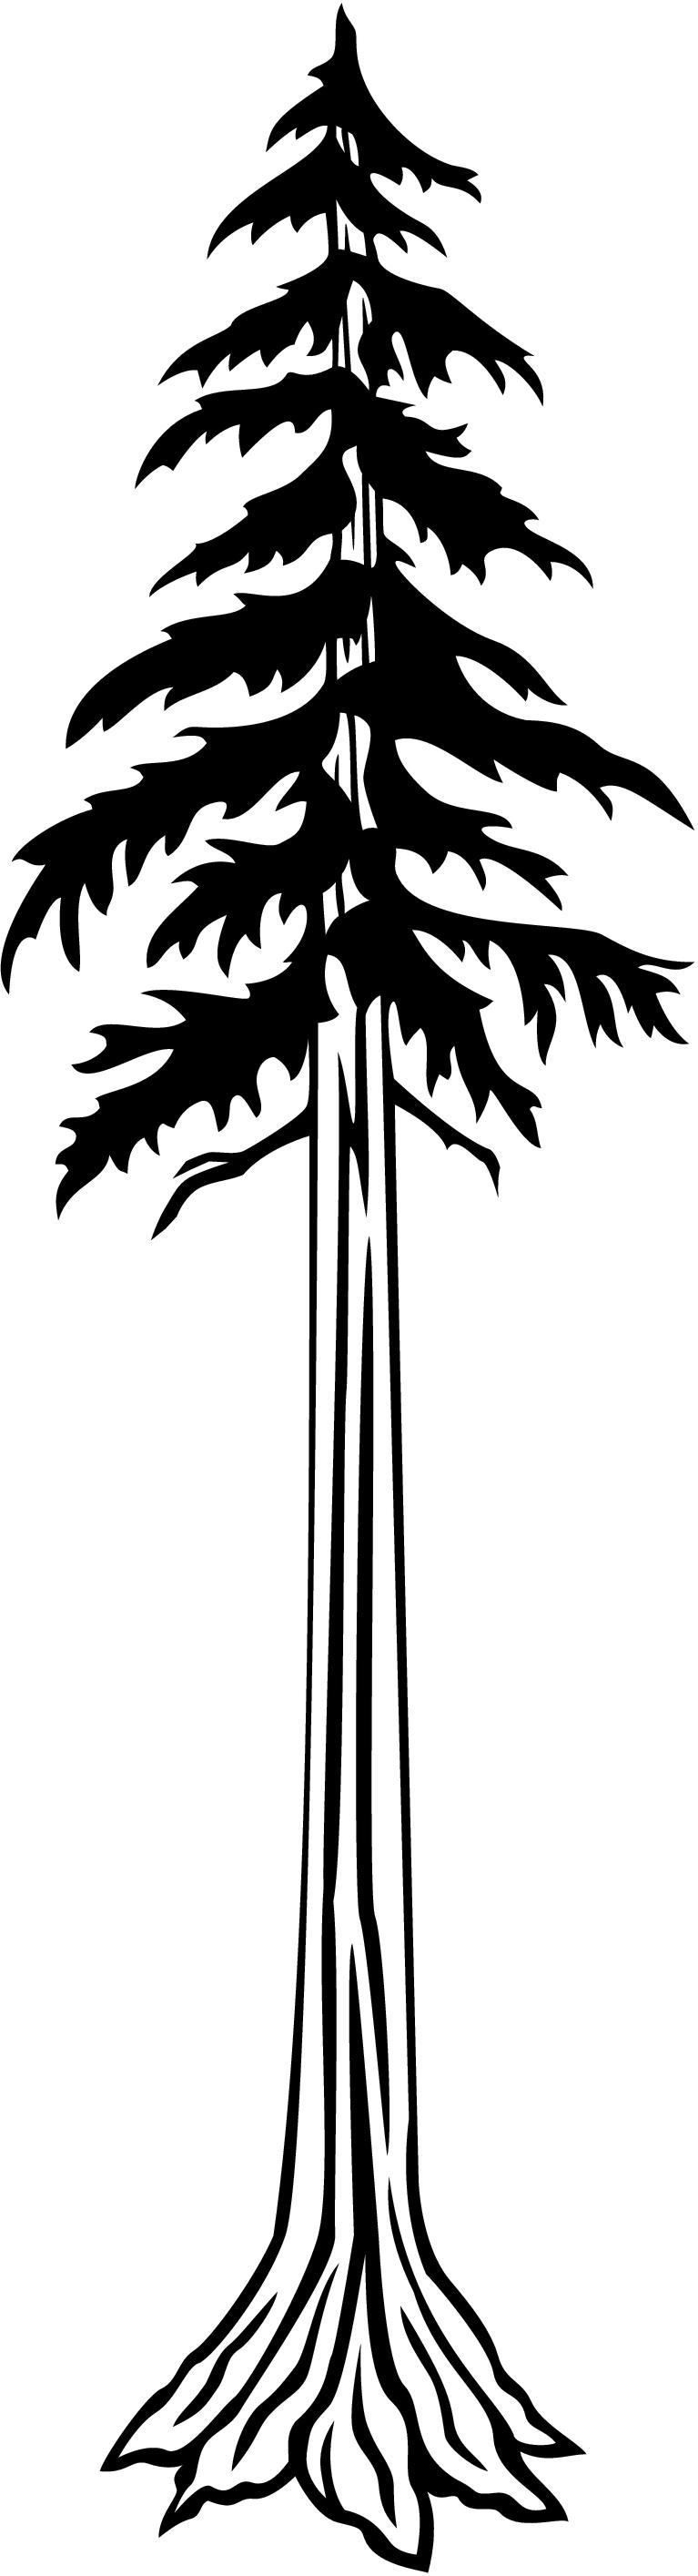 Redwood Tree Clip Art - ClipArt Best